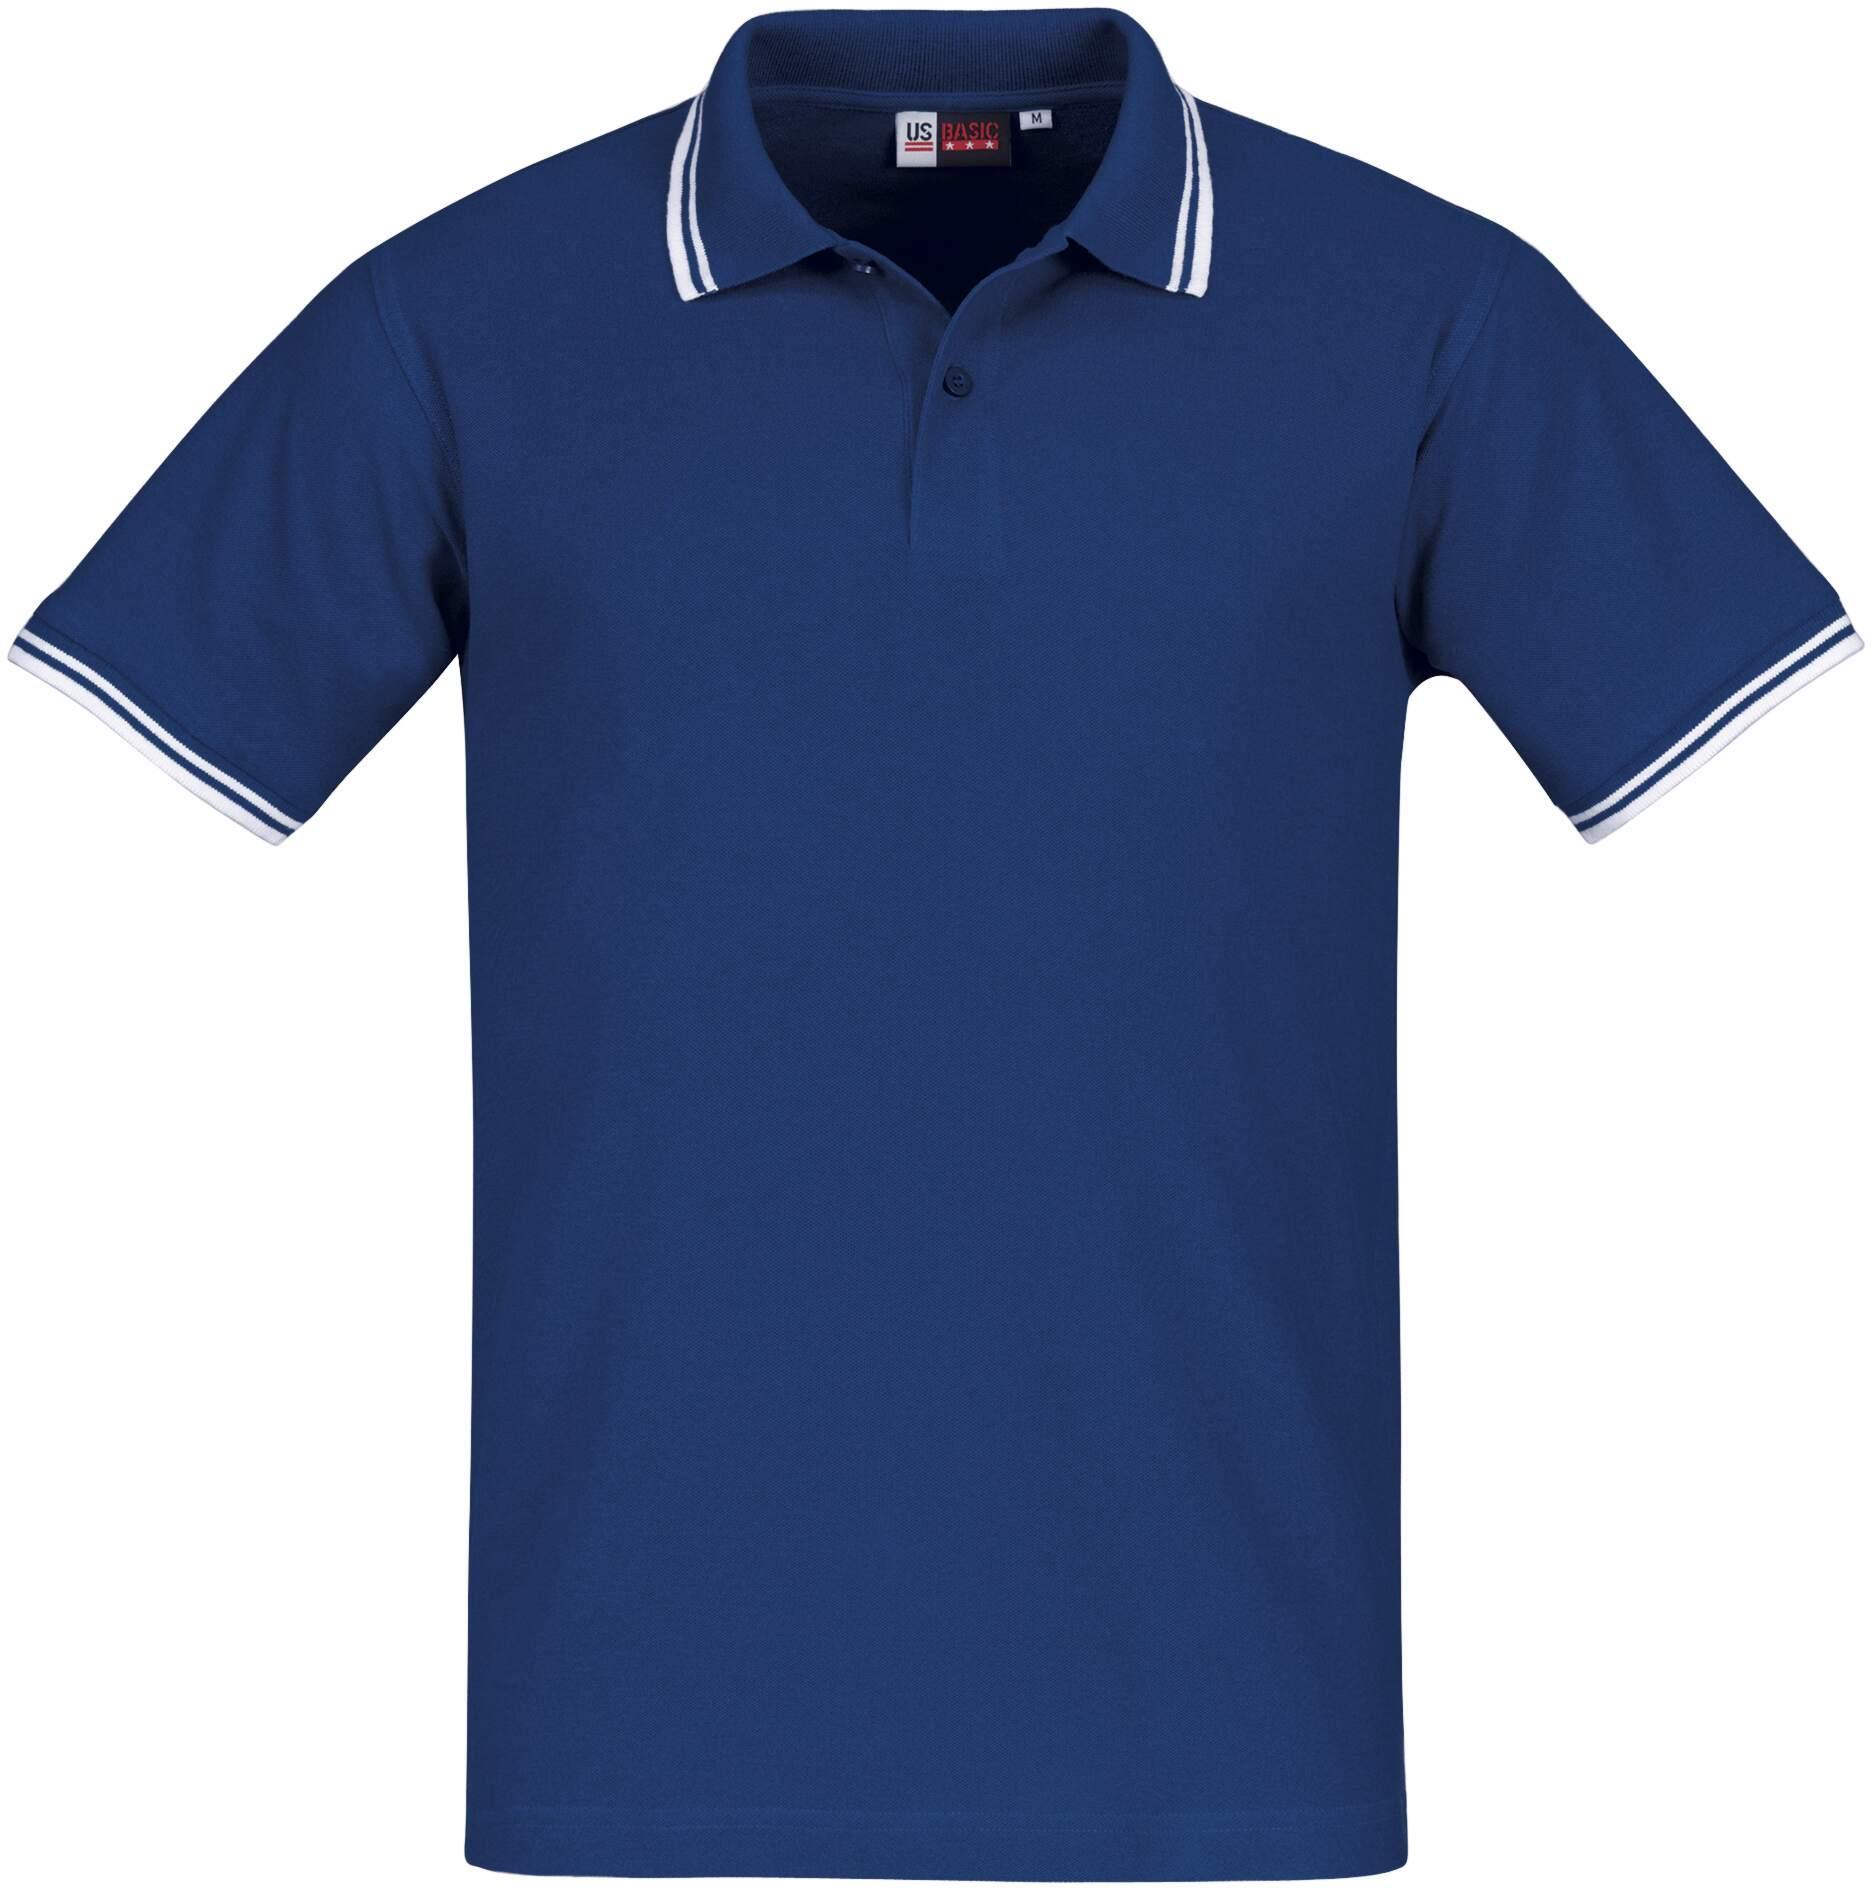 Koszulki Polo Lady US 31100 Erie - 31100_błekit królewski_biały_US - Kolor: Błękit królewski / Biały